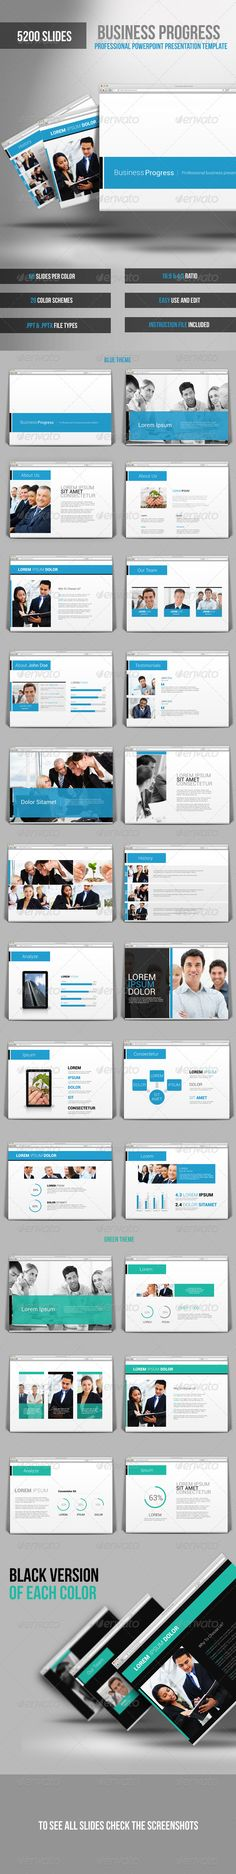 PowerPoint Business Presentation Template Business presentation - business presentation